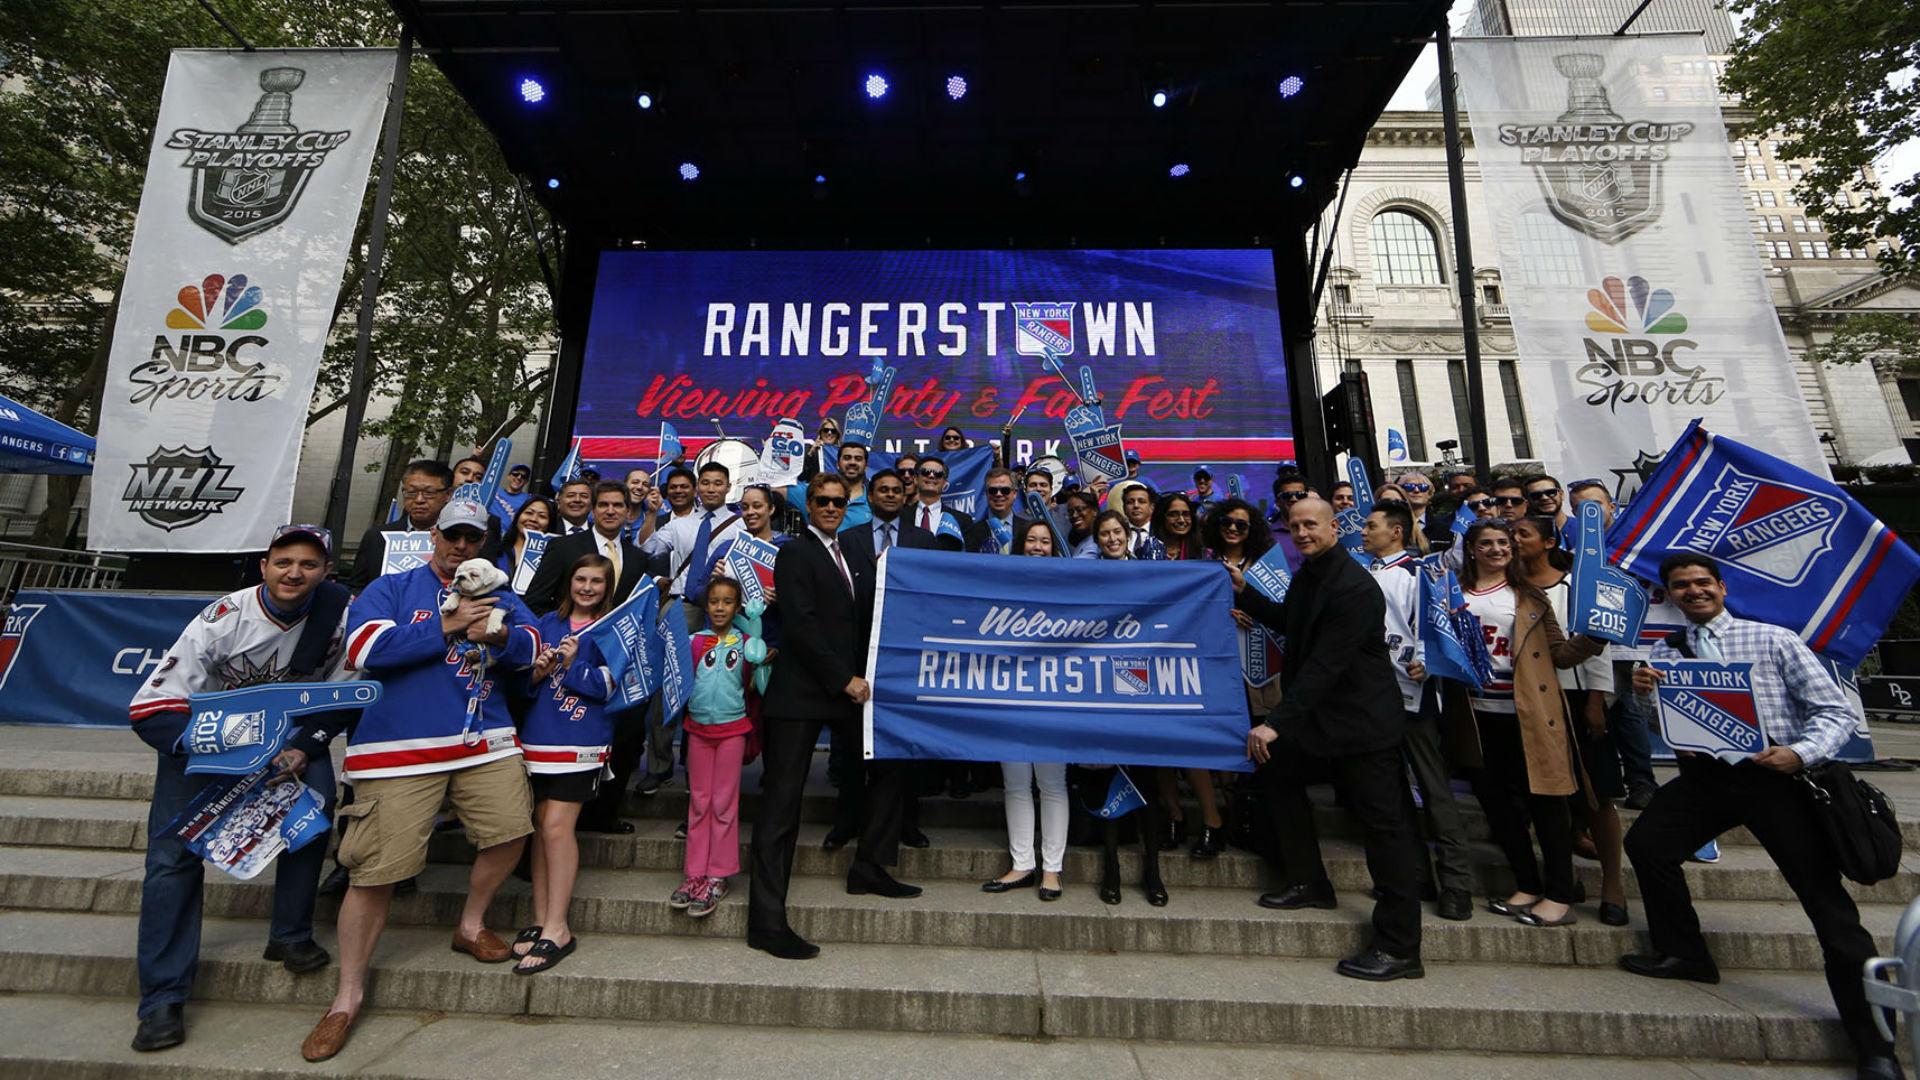 Doesn't matter if Rangers or Lightning lose, sponsor Chase already a winner